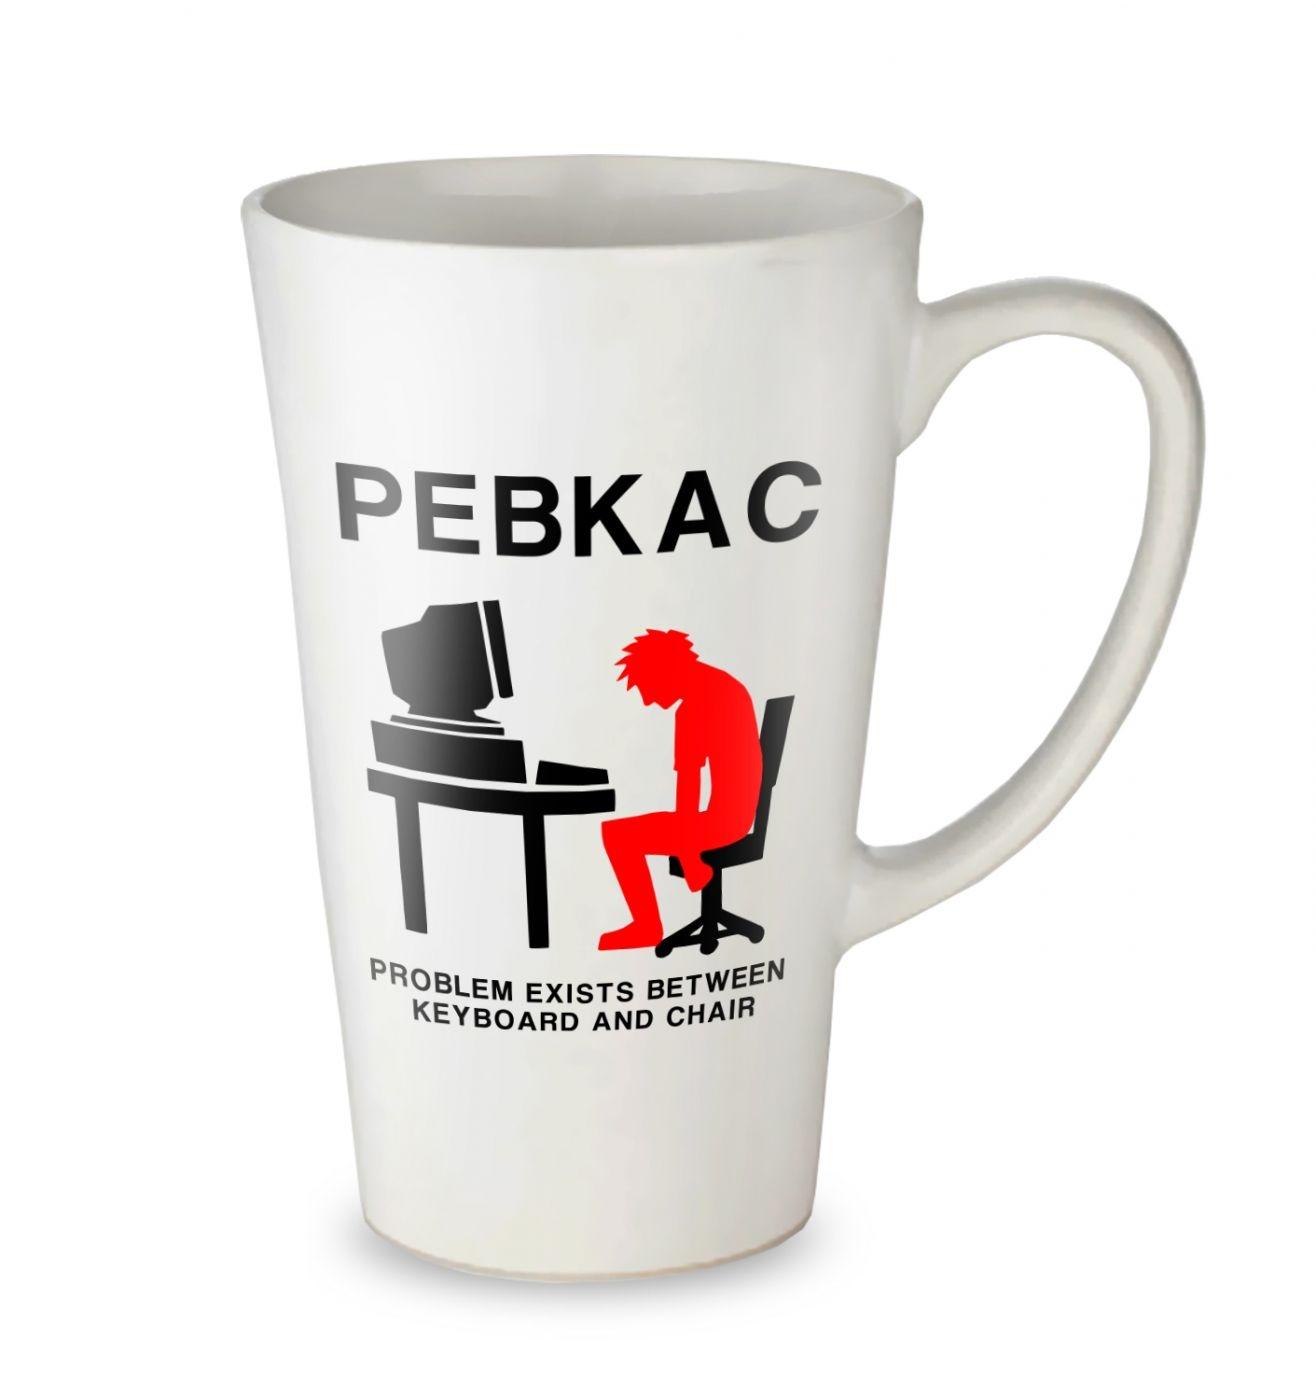 PEBKAC tall latte mug